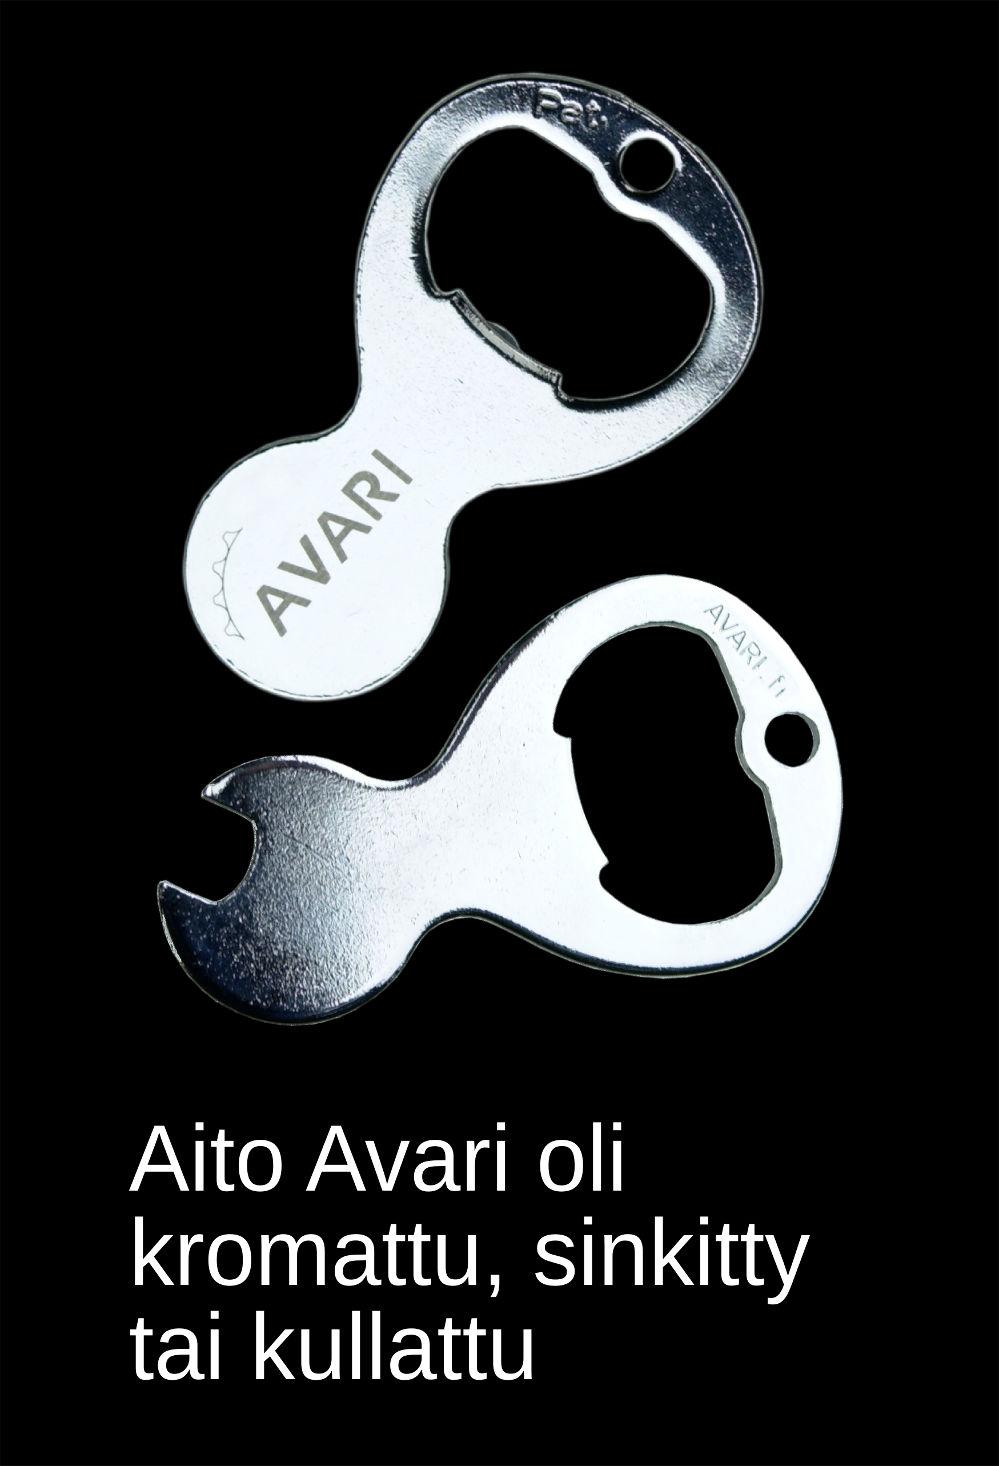 Aito-AVARI